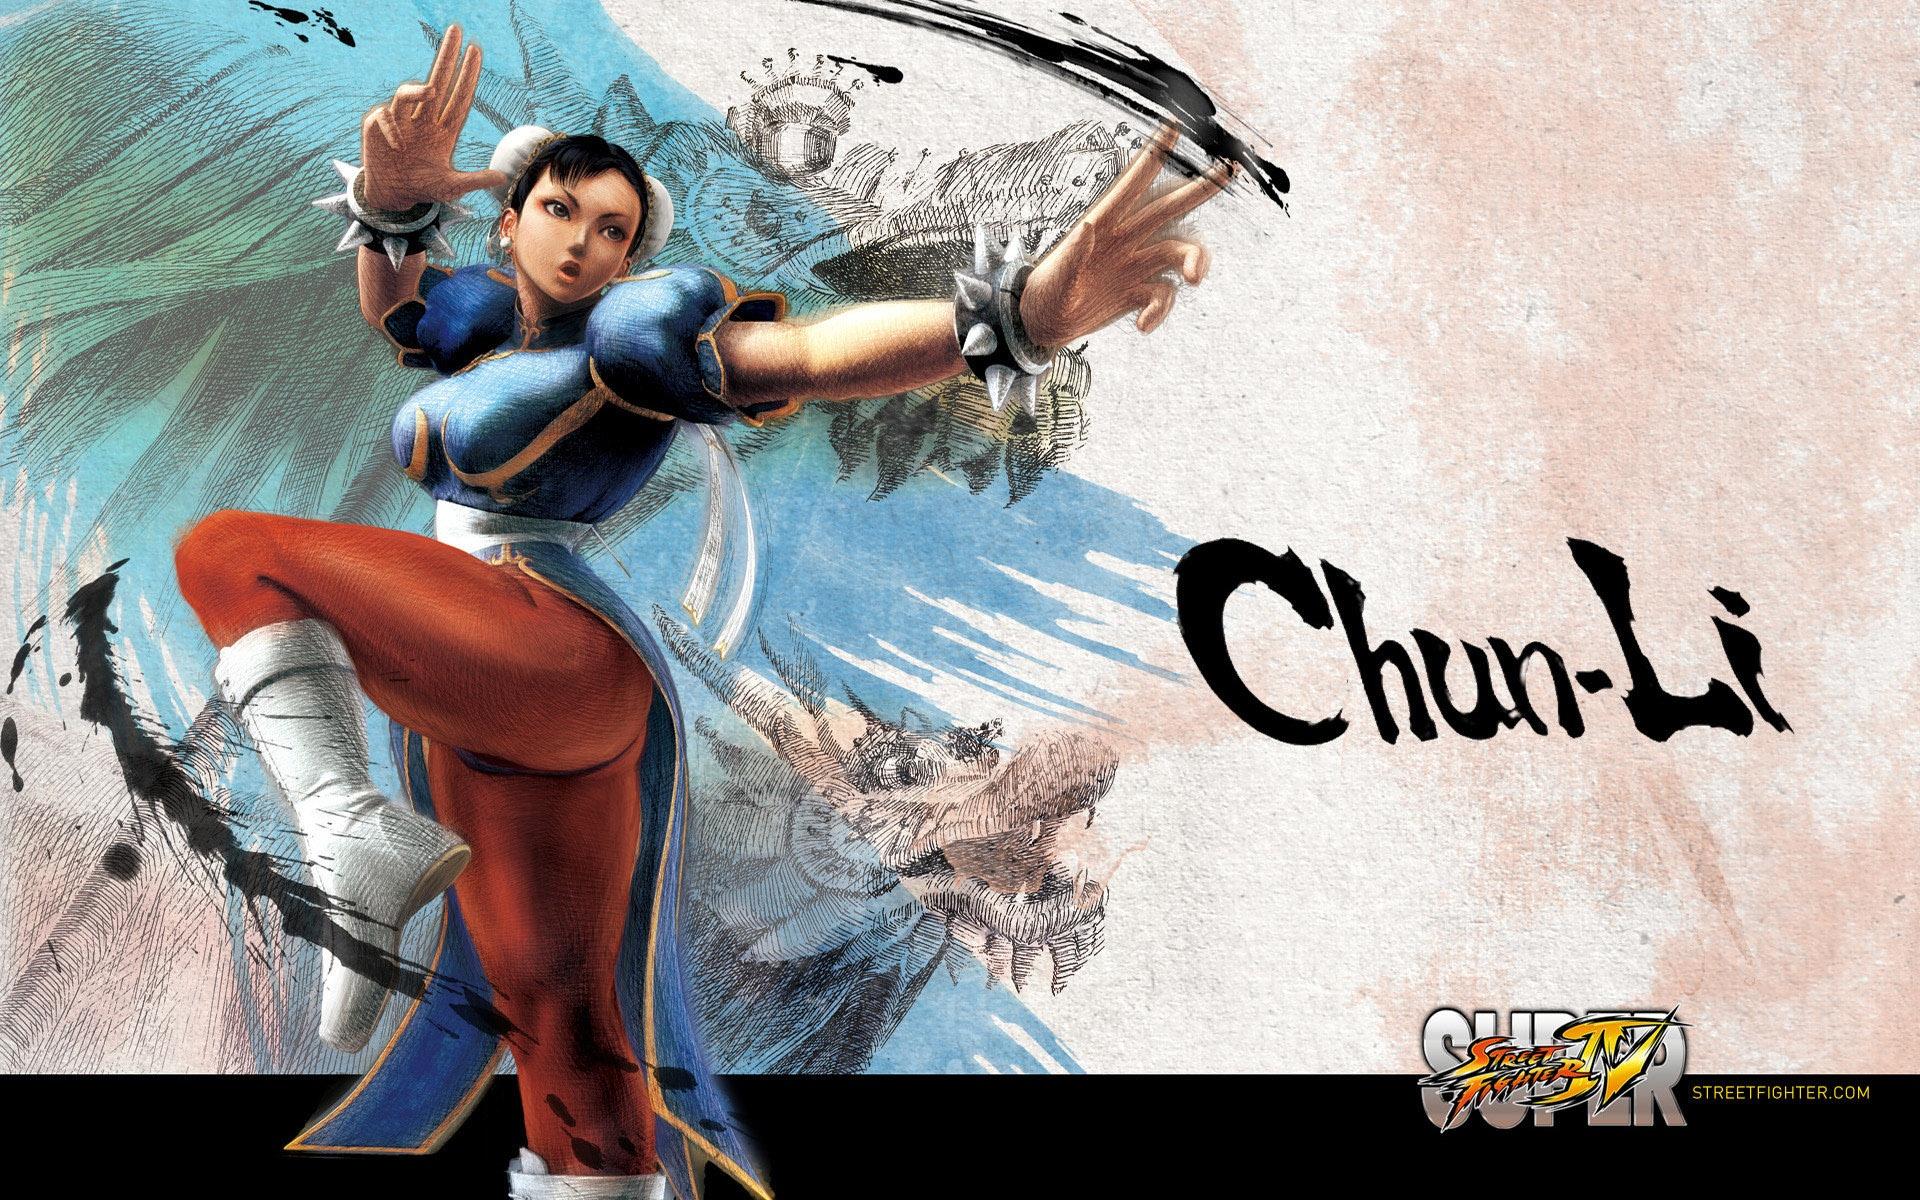 Street Fighter 4 Wallpapers: Super Street Fighter IV Character Wallpaper